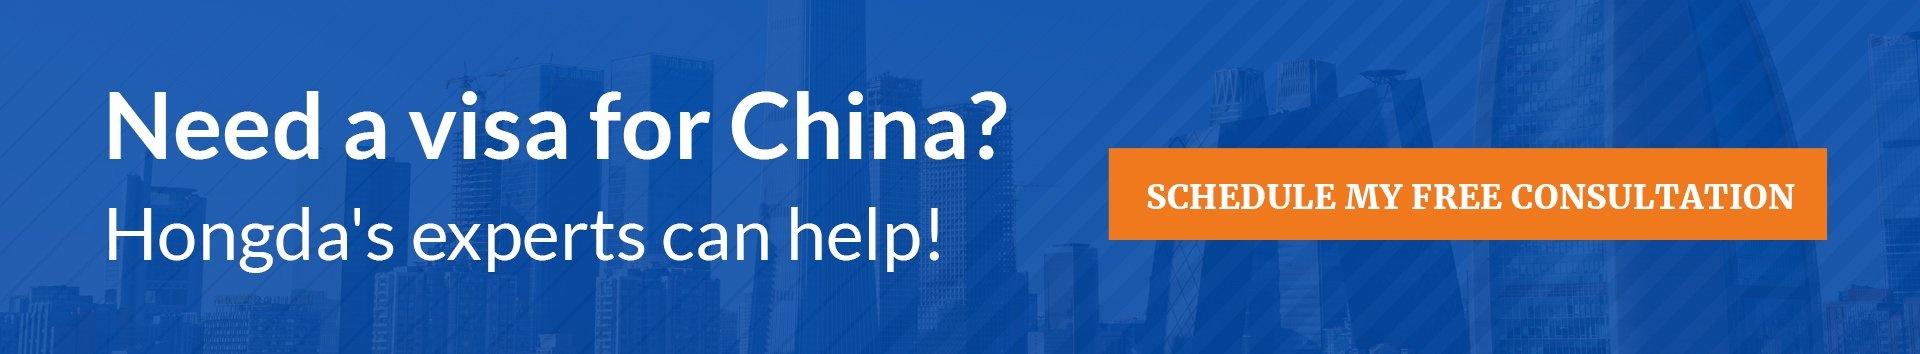 China visa application free consultation